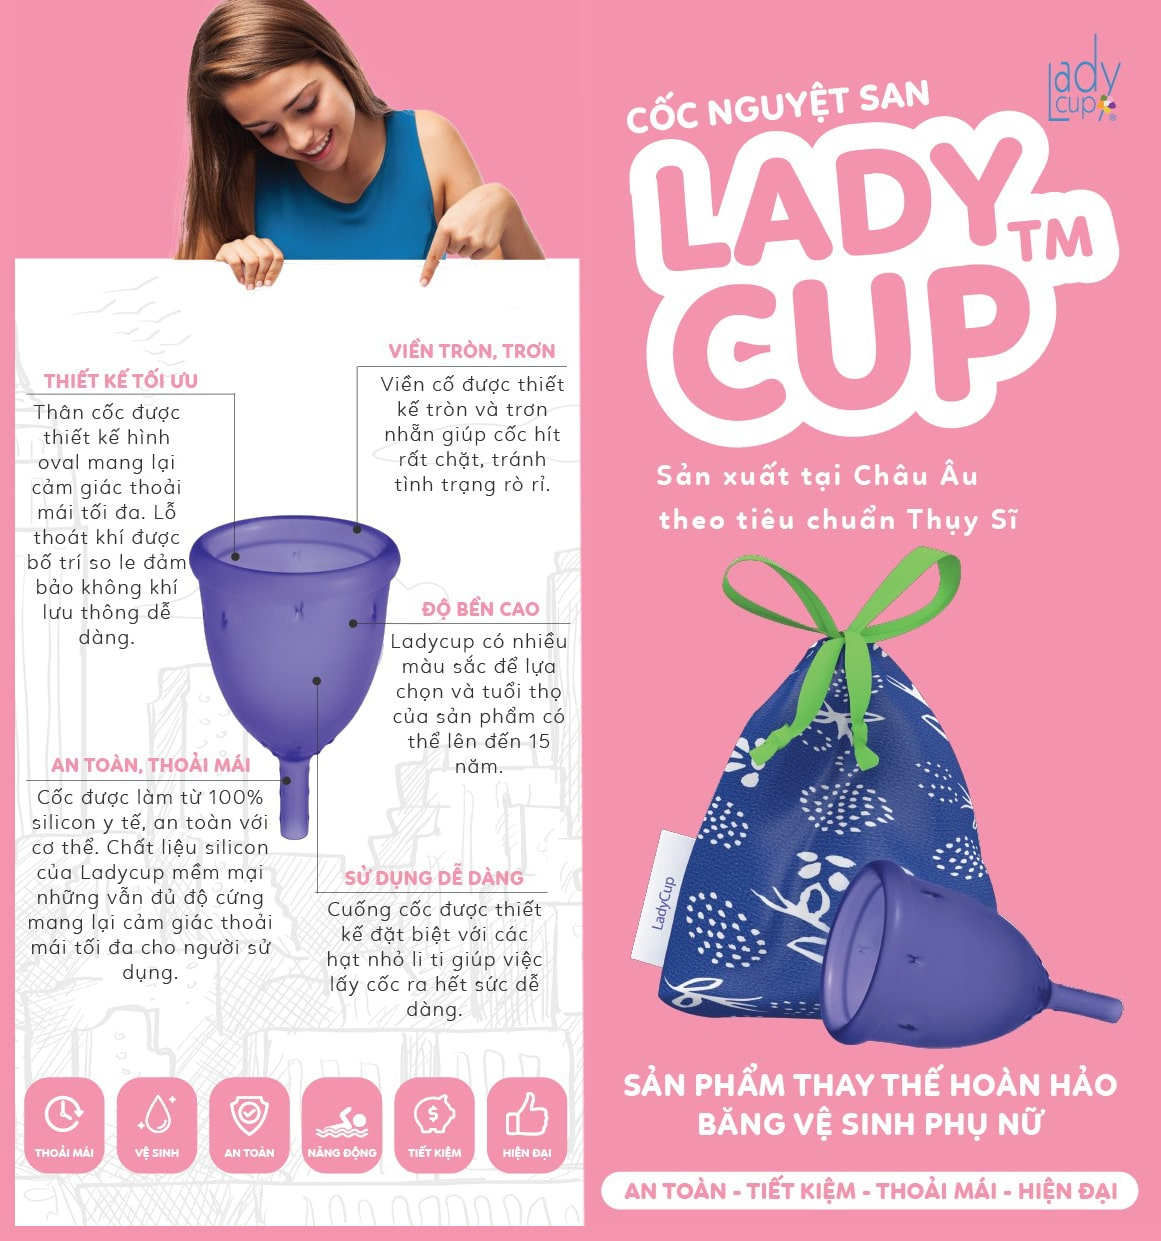 Cốc nguyệt san Lady Cup